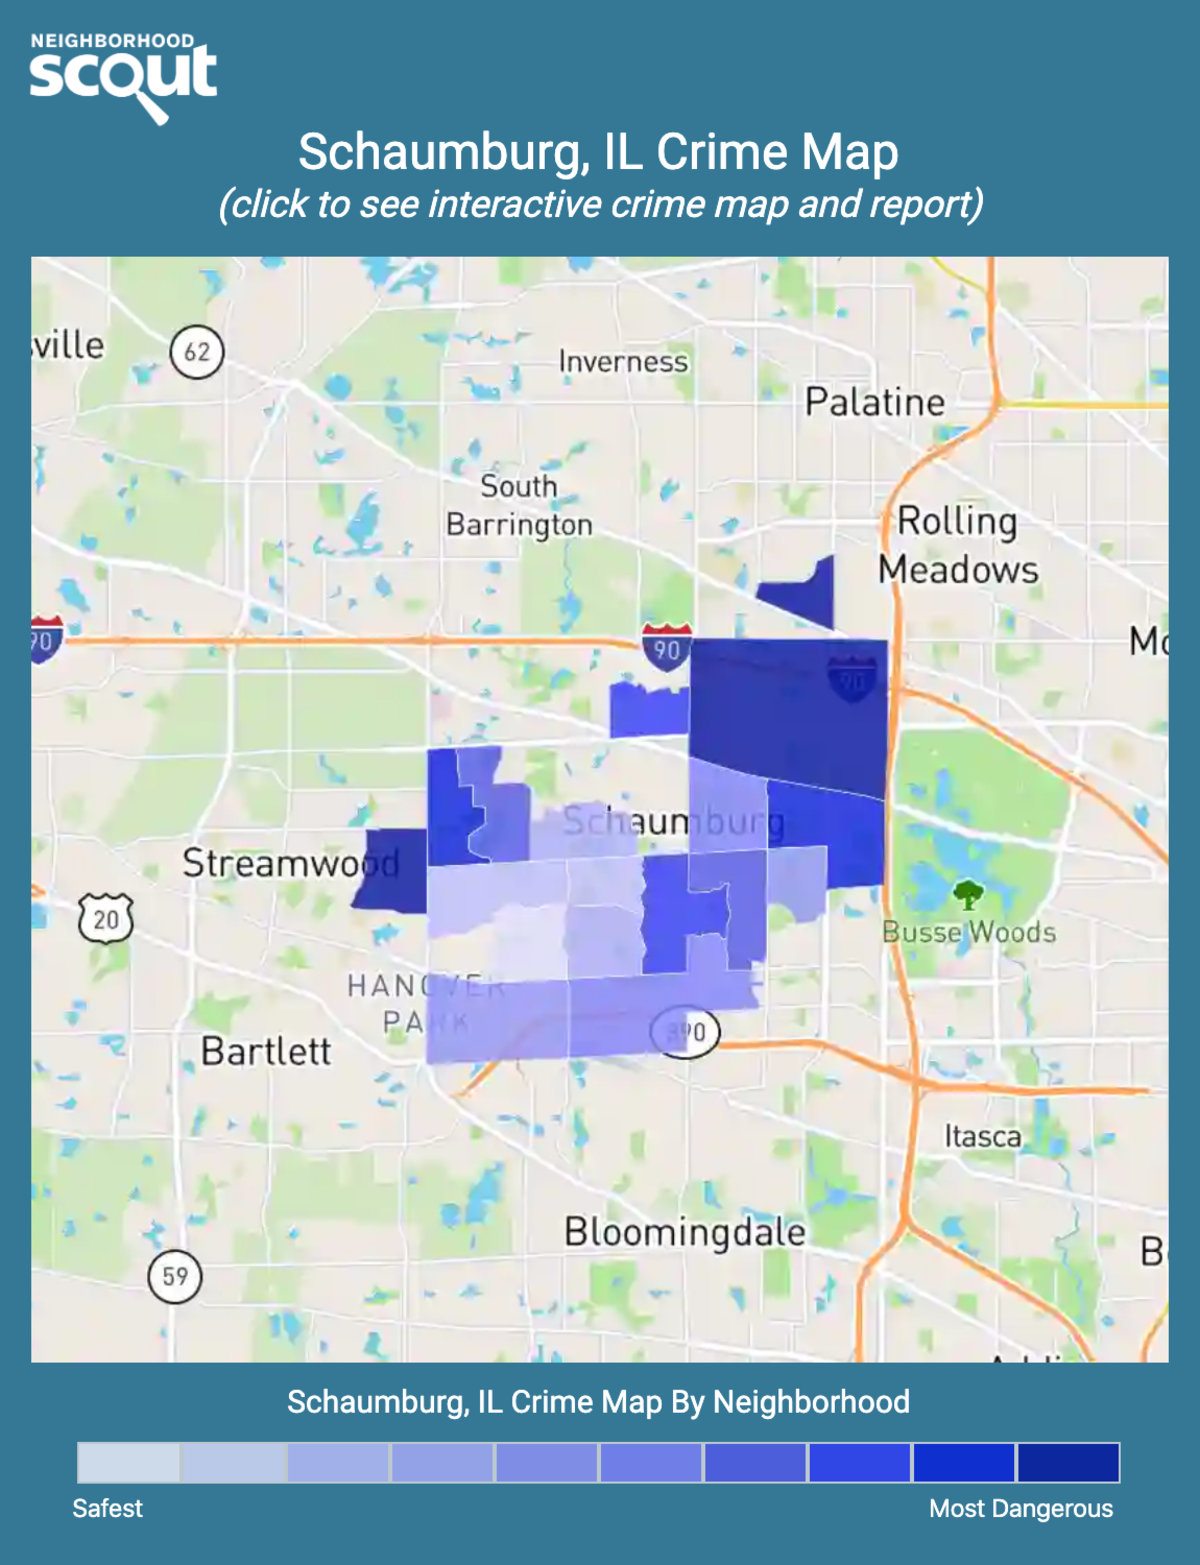 Schaumburg, Illinois crime map